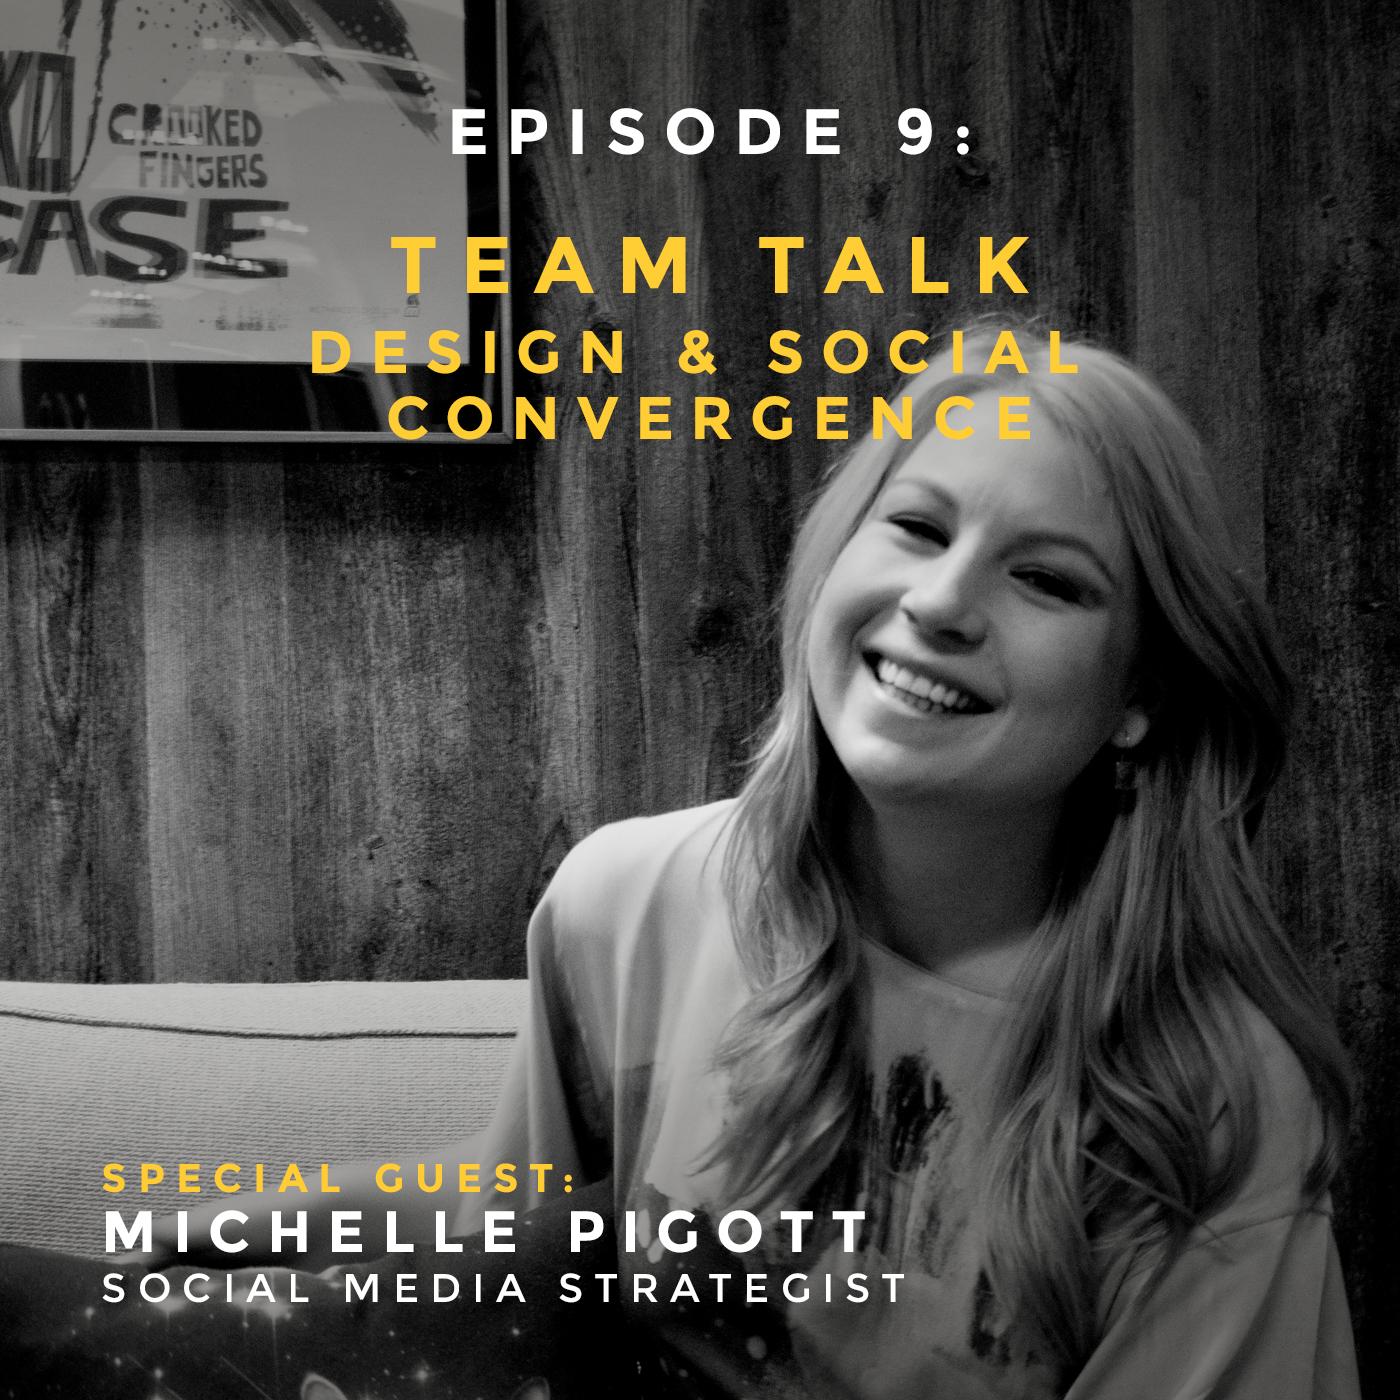 Team Talk with Michelle Pigott of Iris Worldwide - Grits X Grids podcast